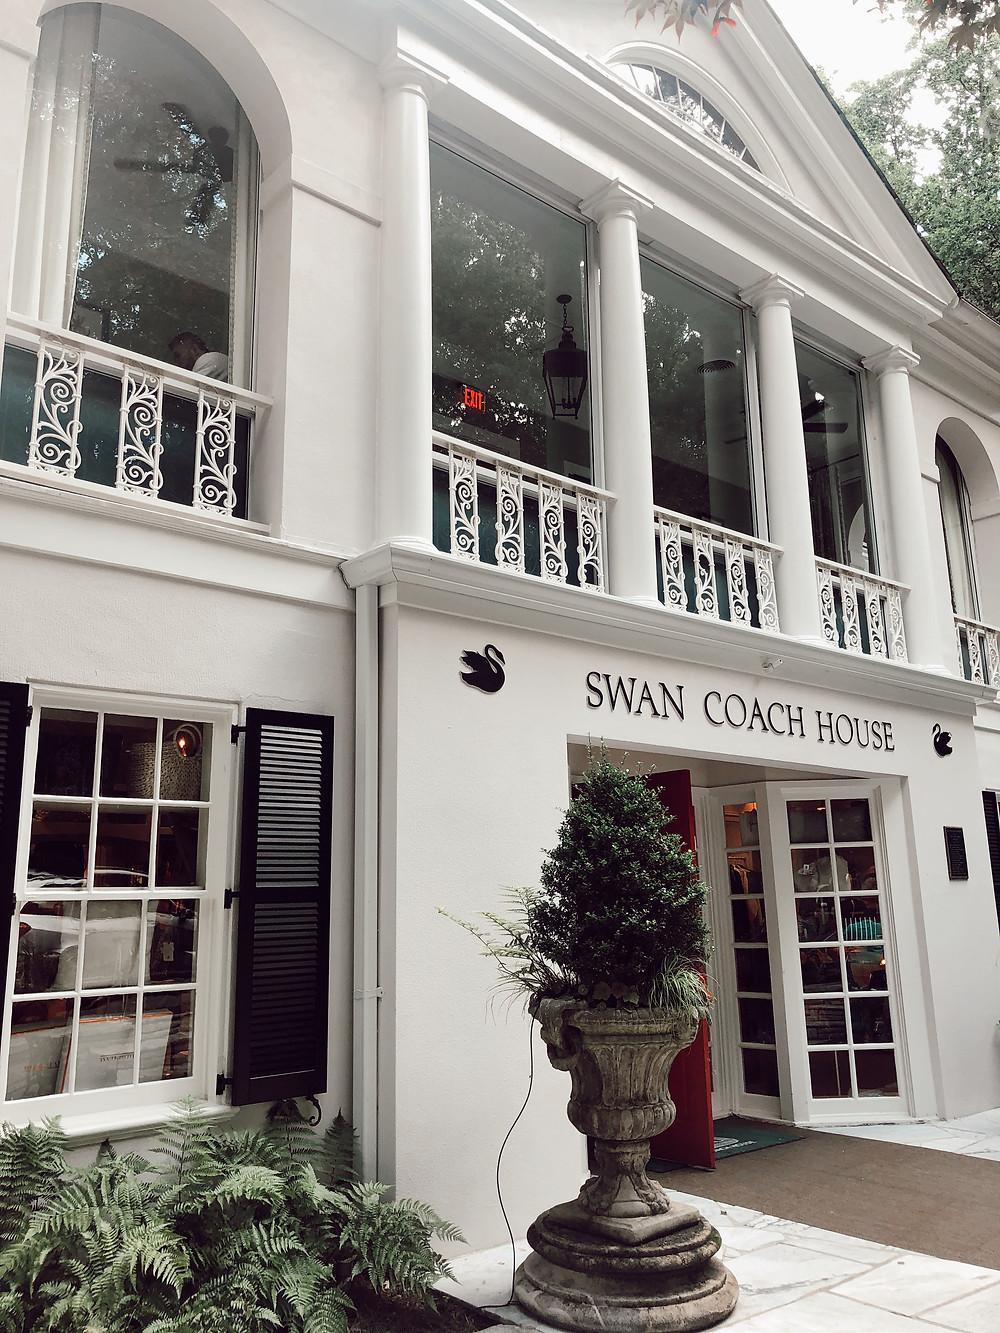 swan coach house, atlanta